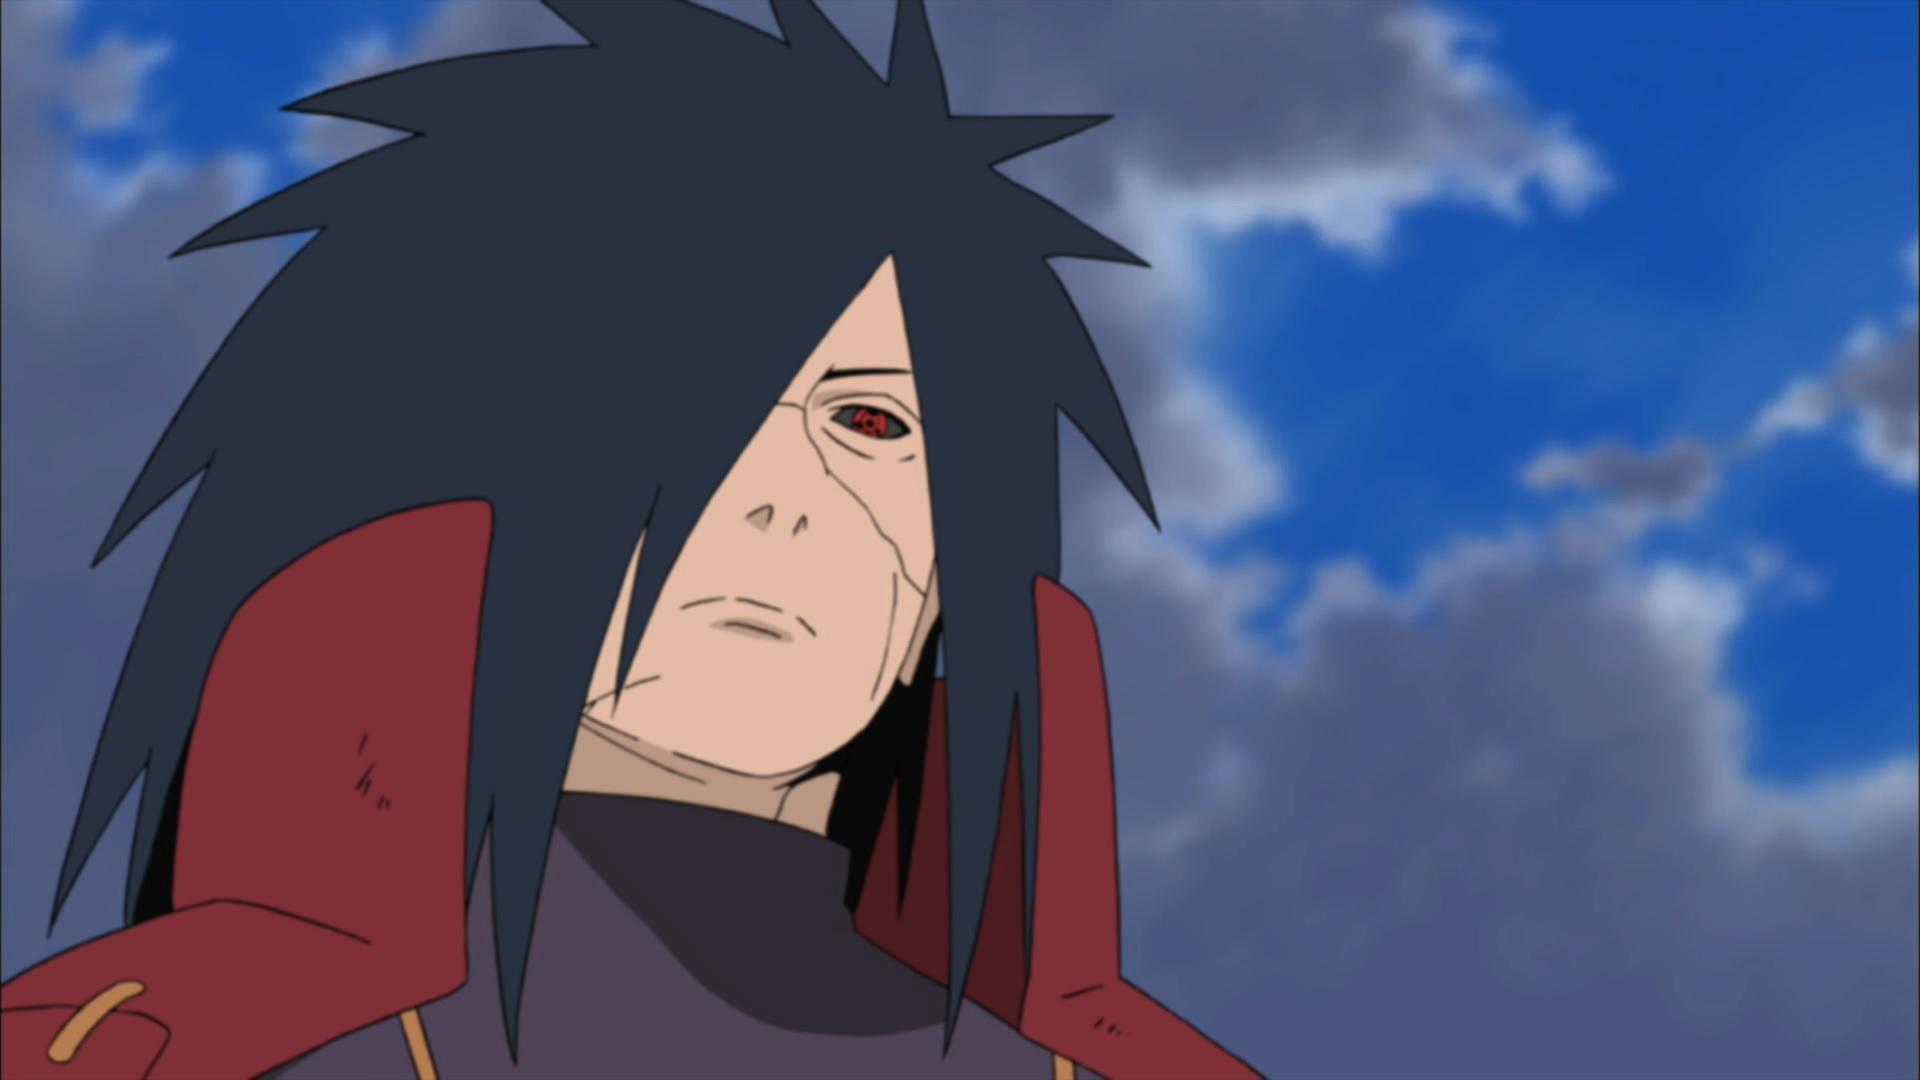 Dev Hd Wallpaper Madara Uchiha Hero Preview Feature Naruto Wars Reborn